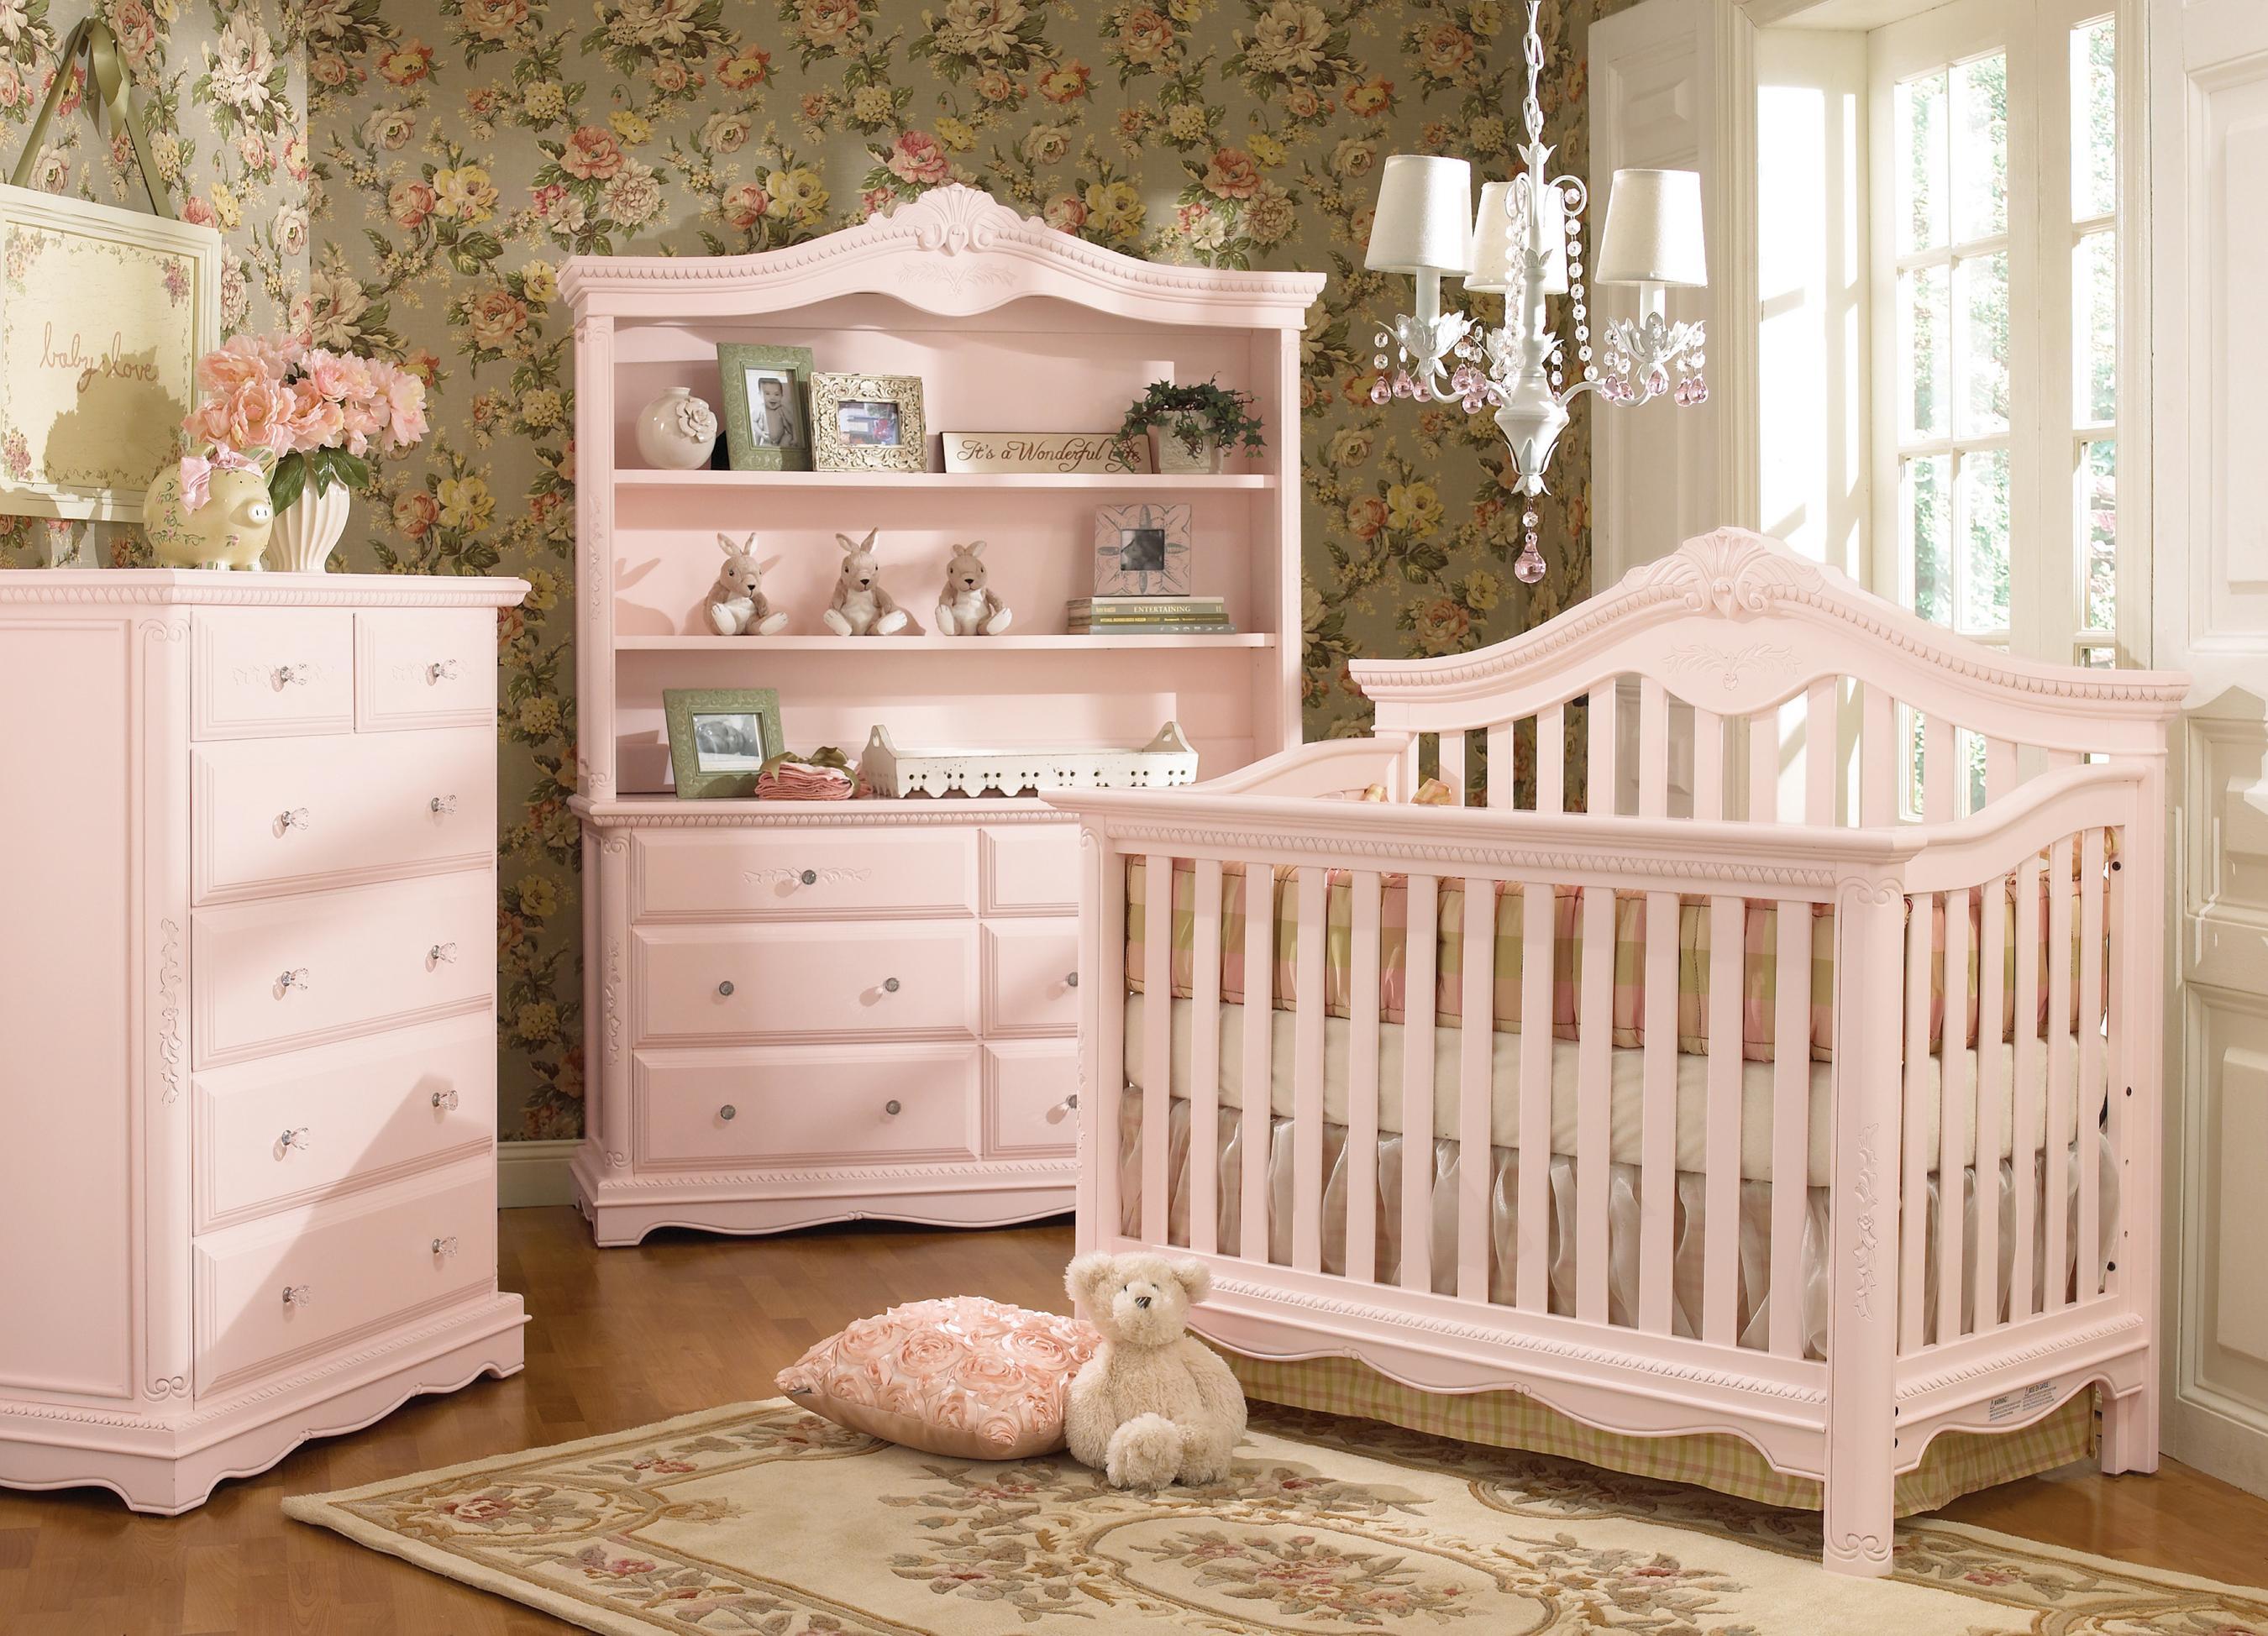 Muniré Furniture Savannah Lifetime Convertable Crib   BigFurnitureWebsite    Crib